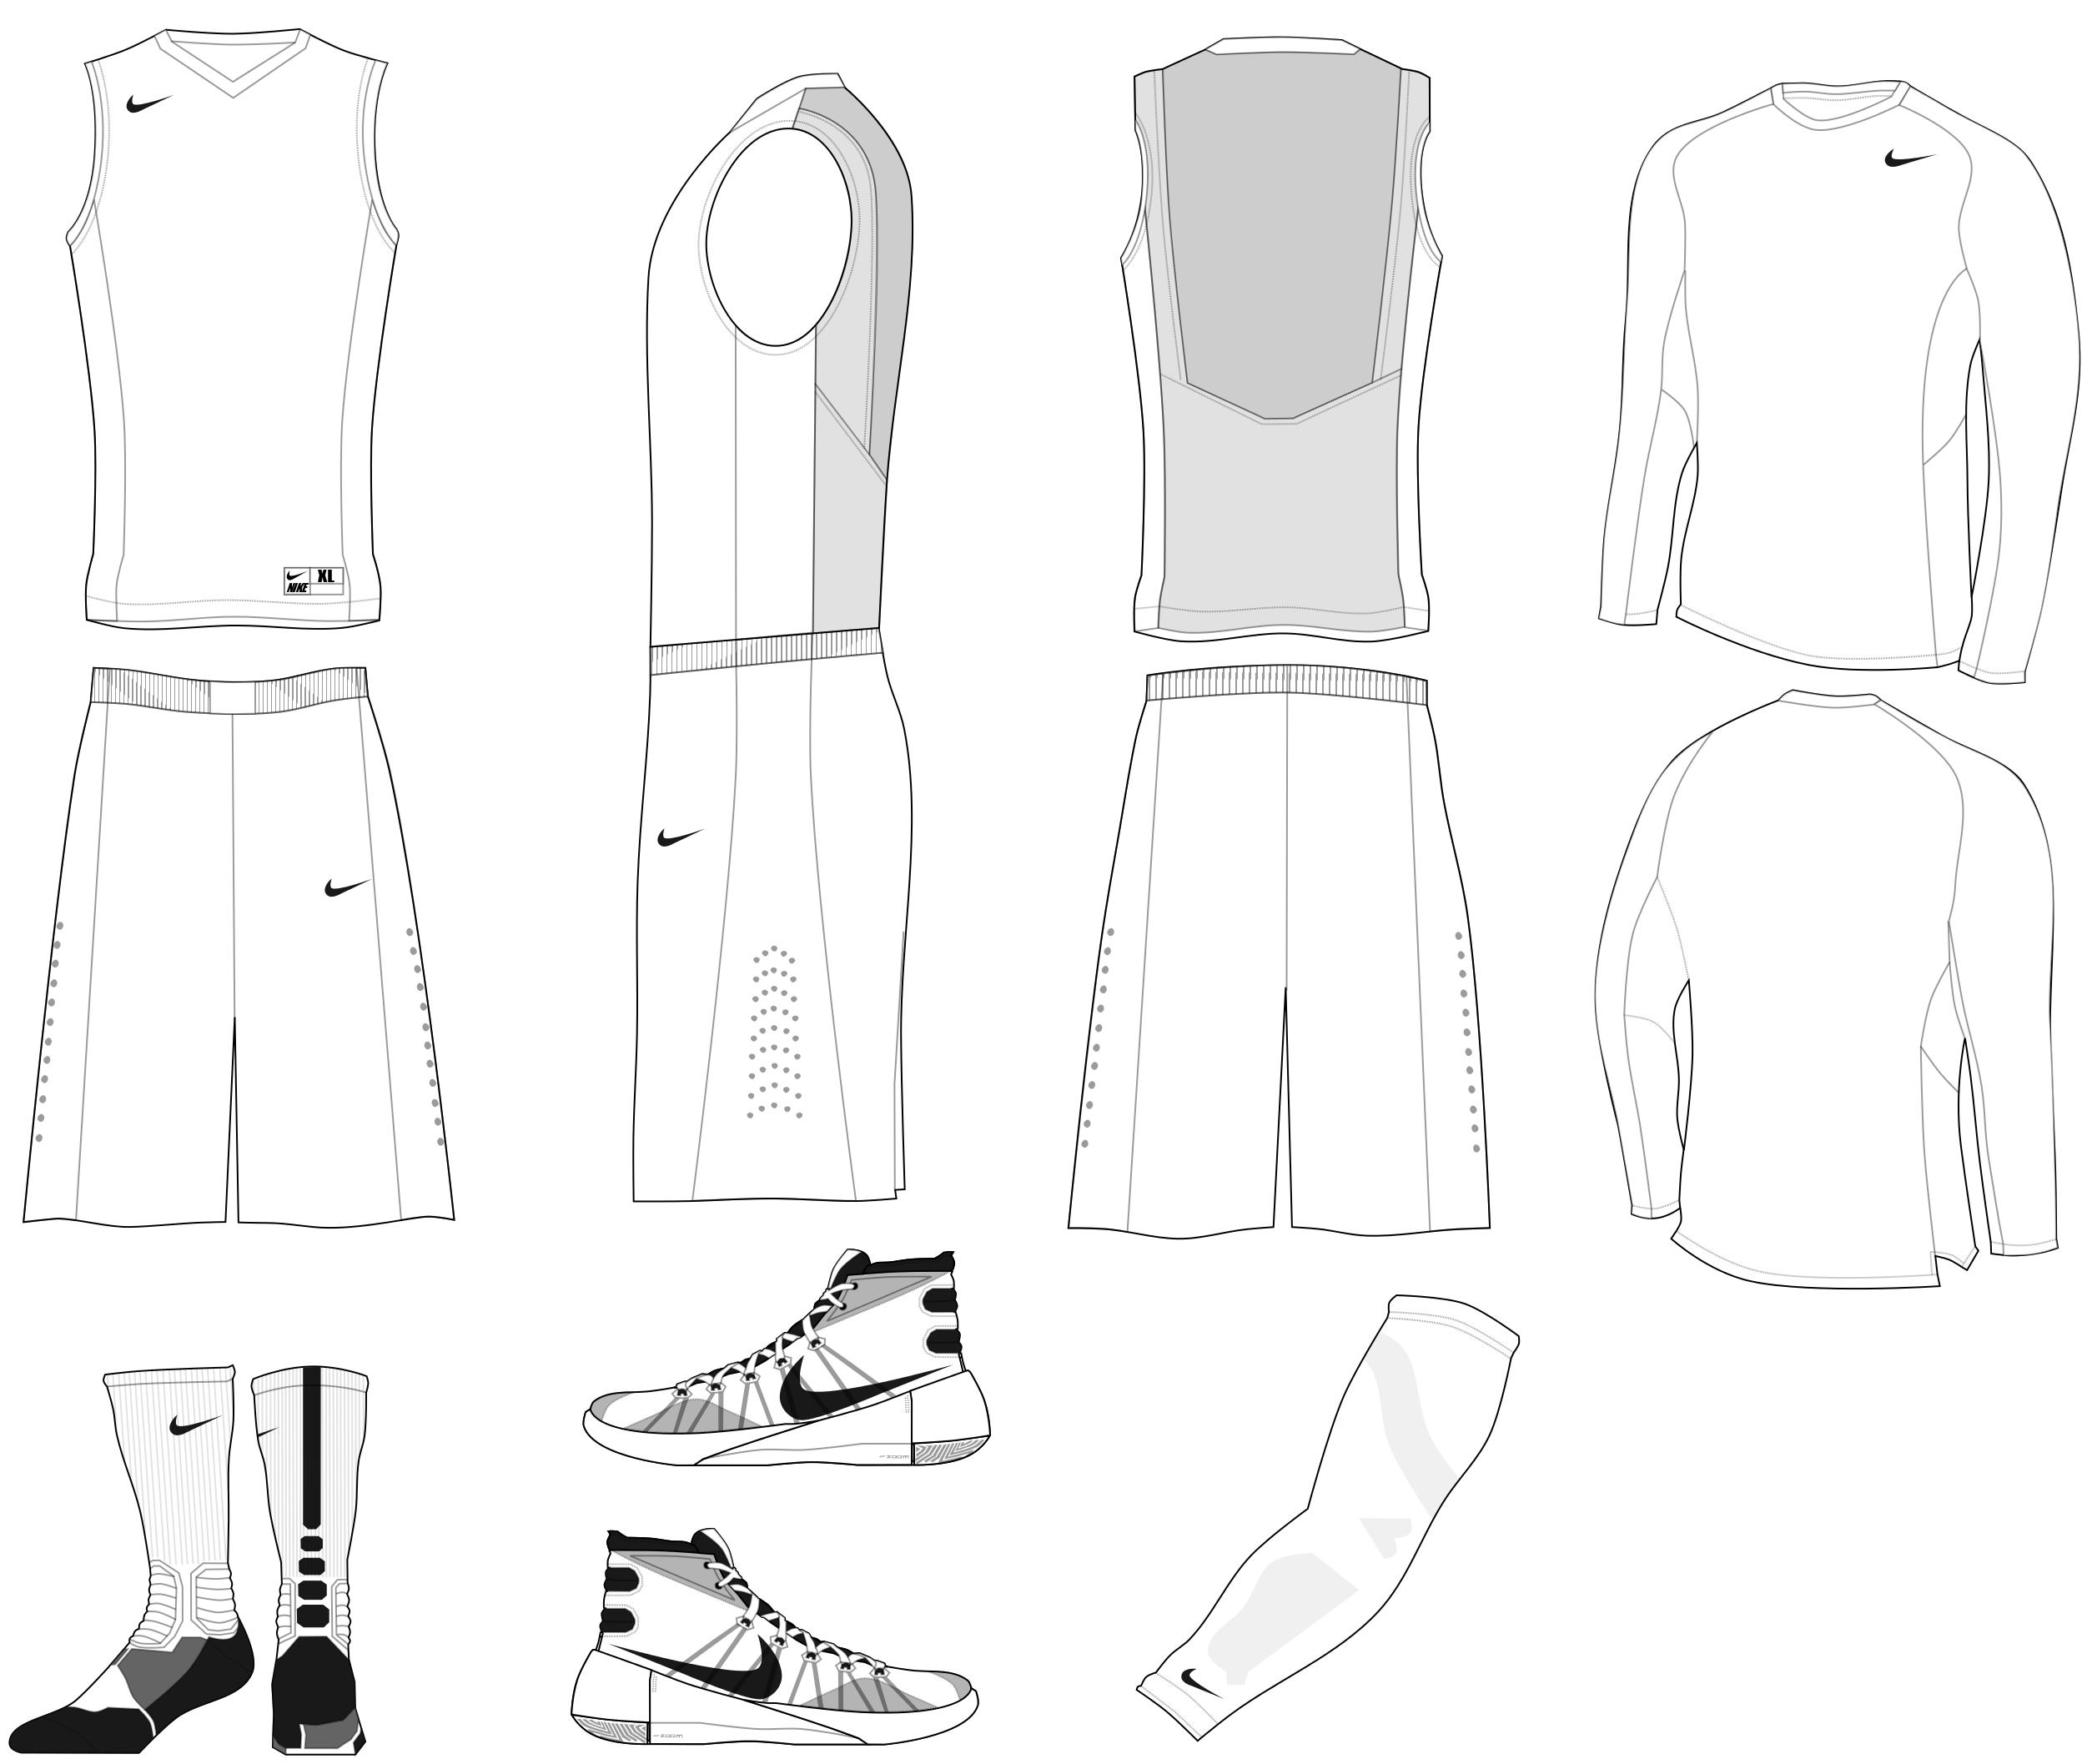 basketball jersey template | dromibi.top | RA | Pinterest